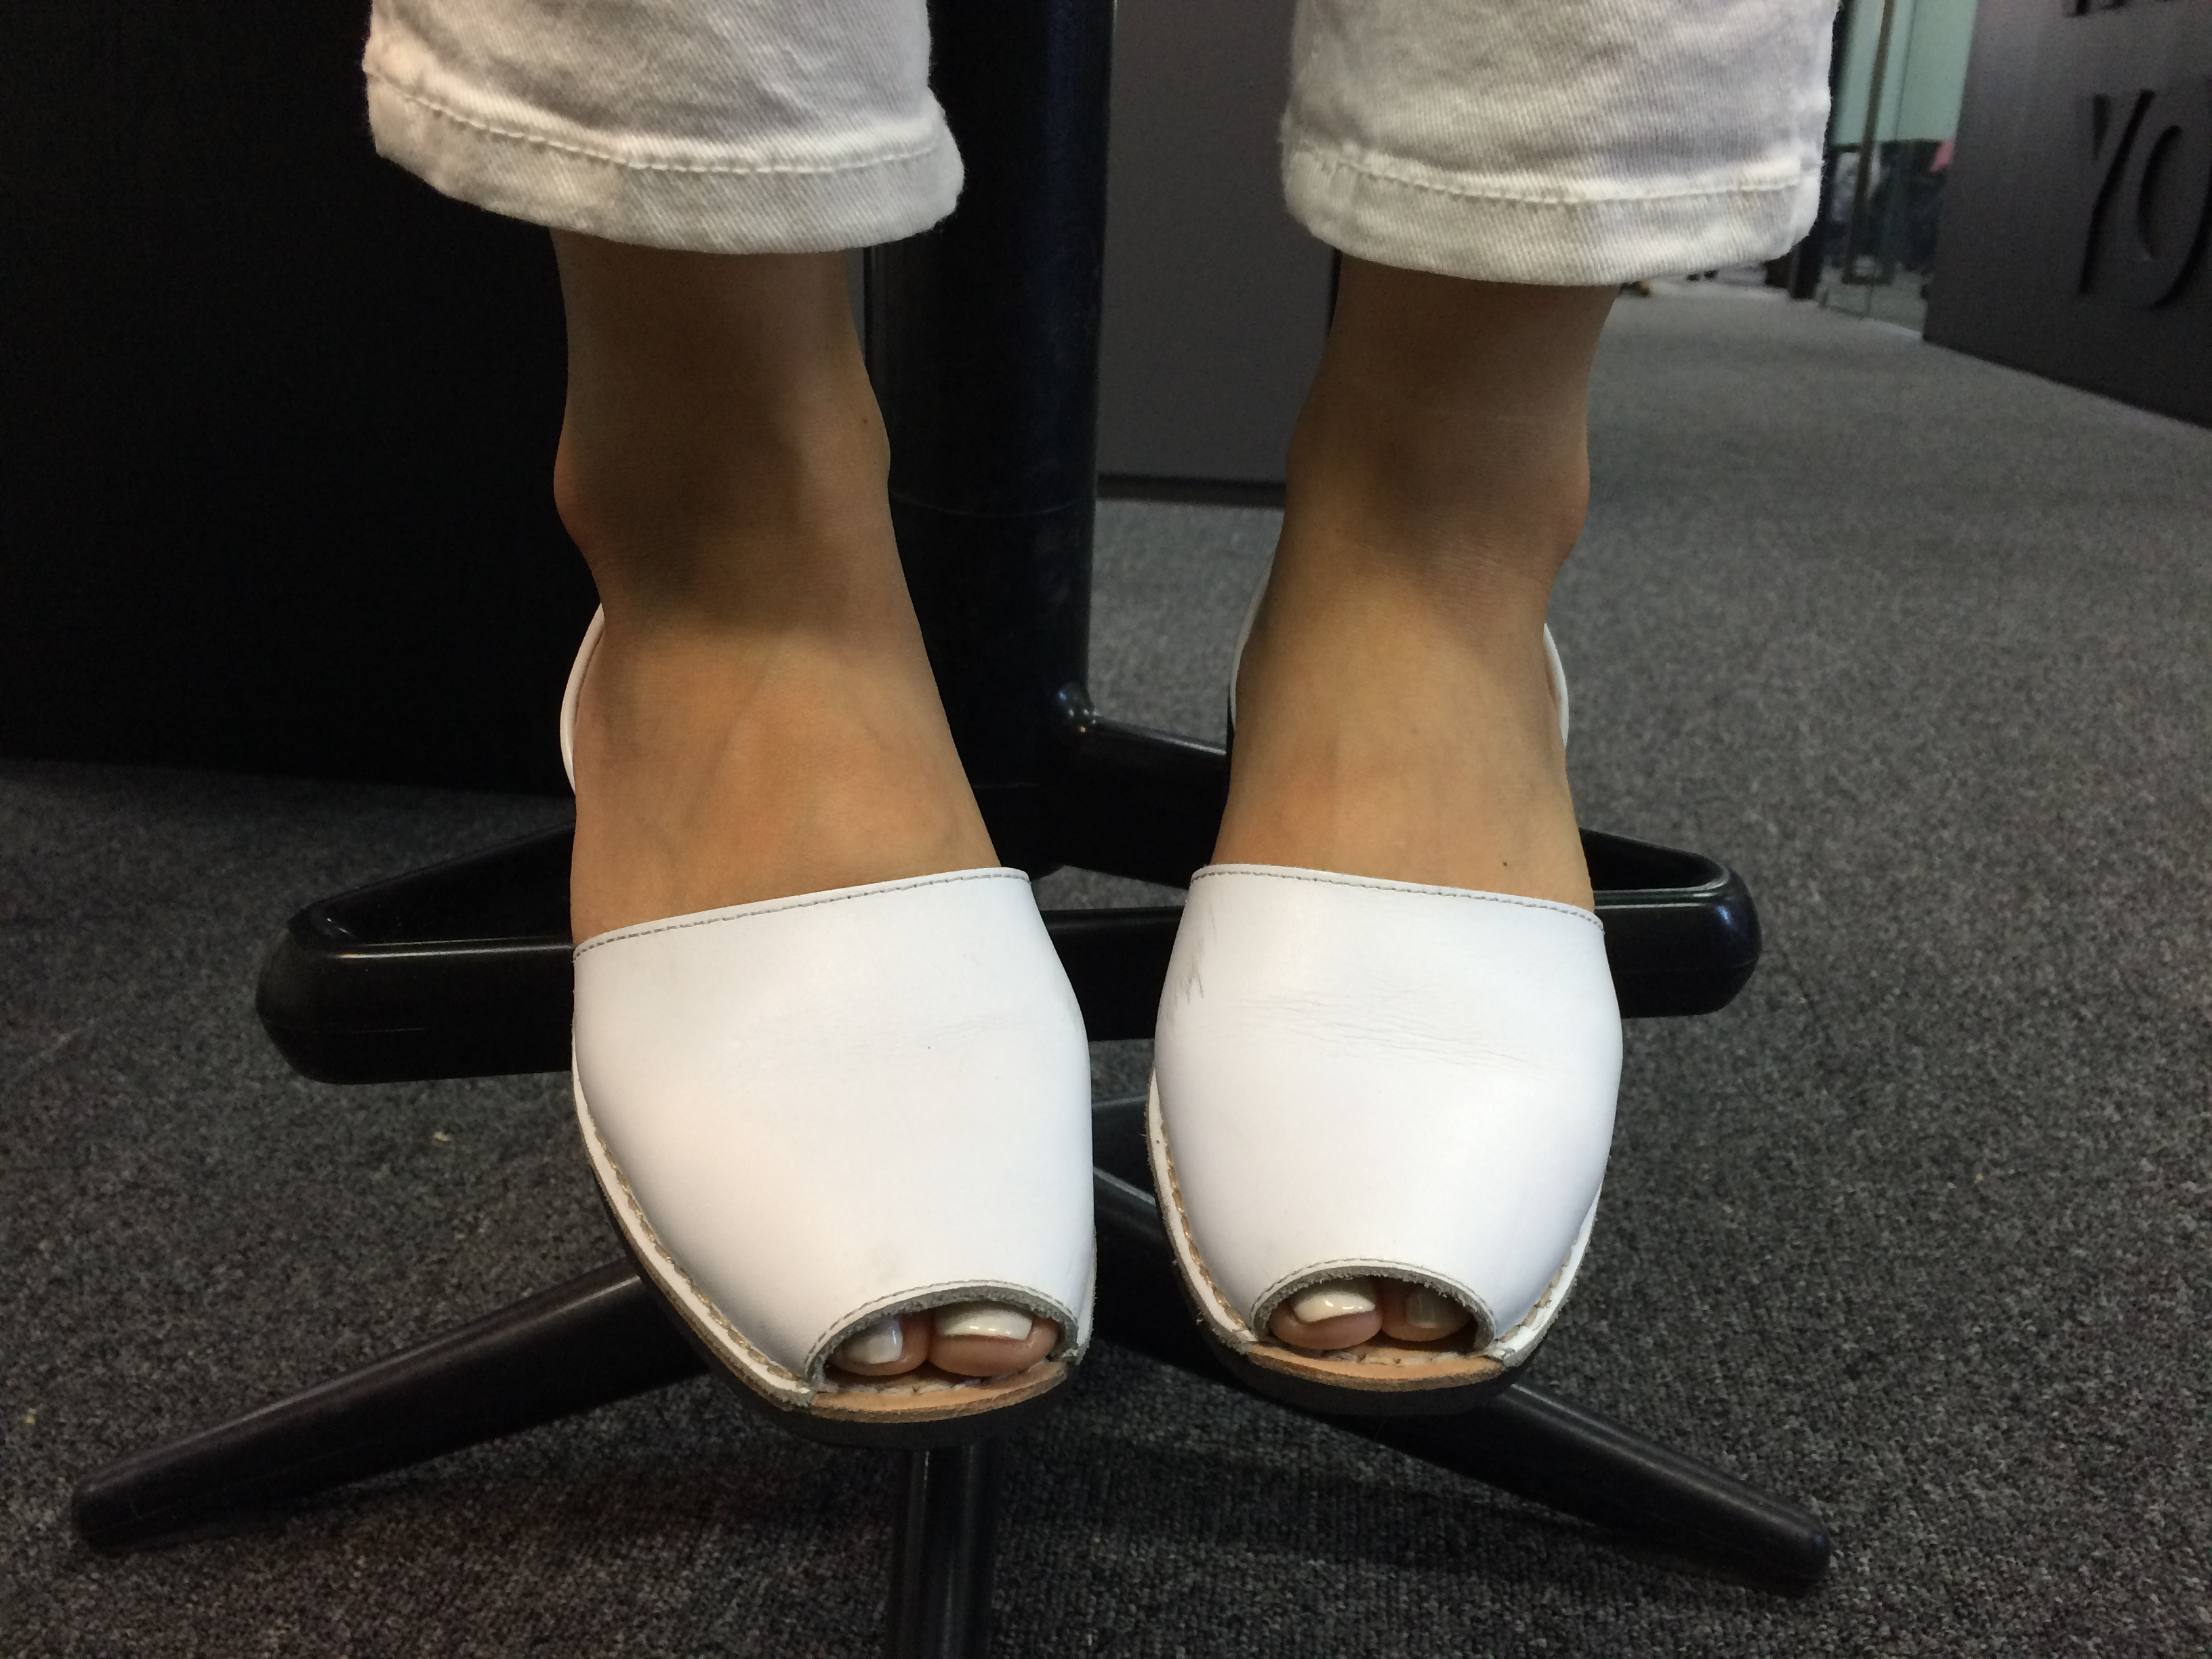 Riudavets的涼鞋是西班牙全國民的國民涼鞋捏!純白的顏色,看起來更清爽~最適合夏天啊!